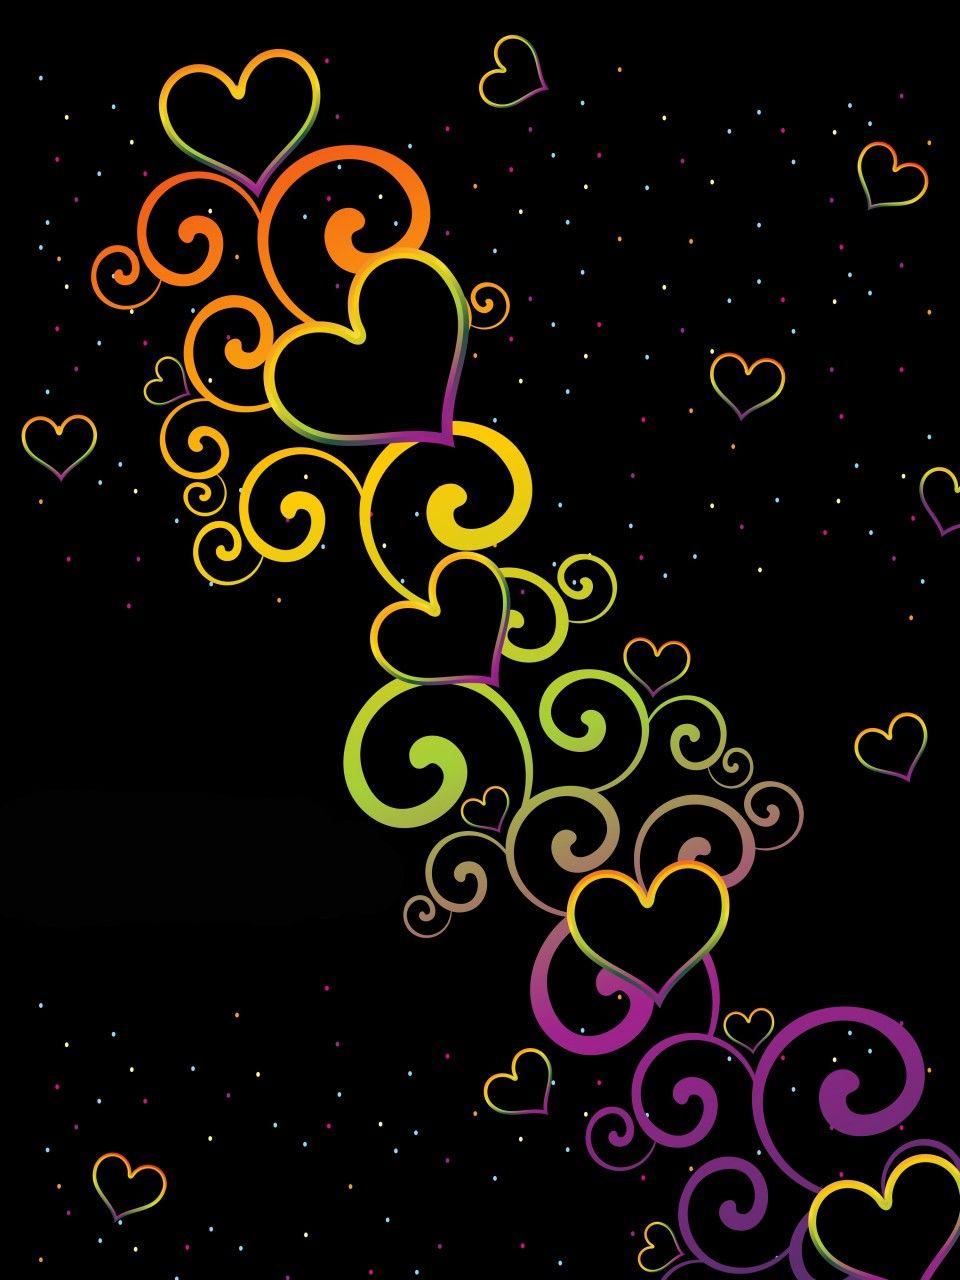 Colorful Hearts On Black Backgrounds Heart Wallpaper Art Wallpaper Cellphone Wallpaper